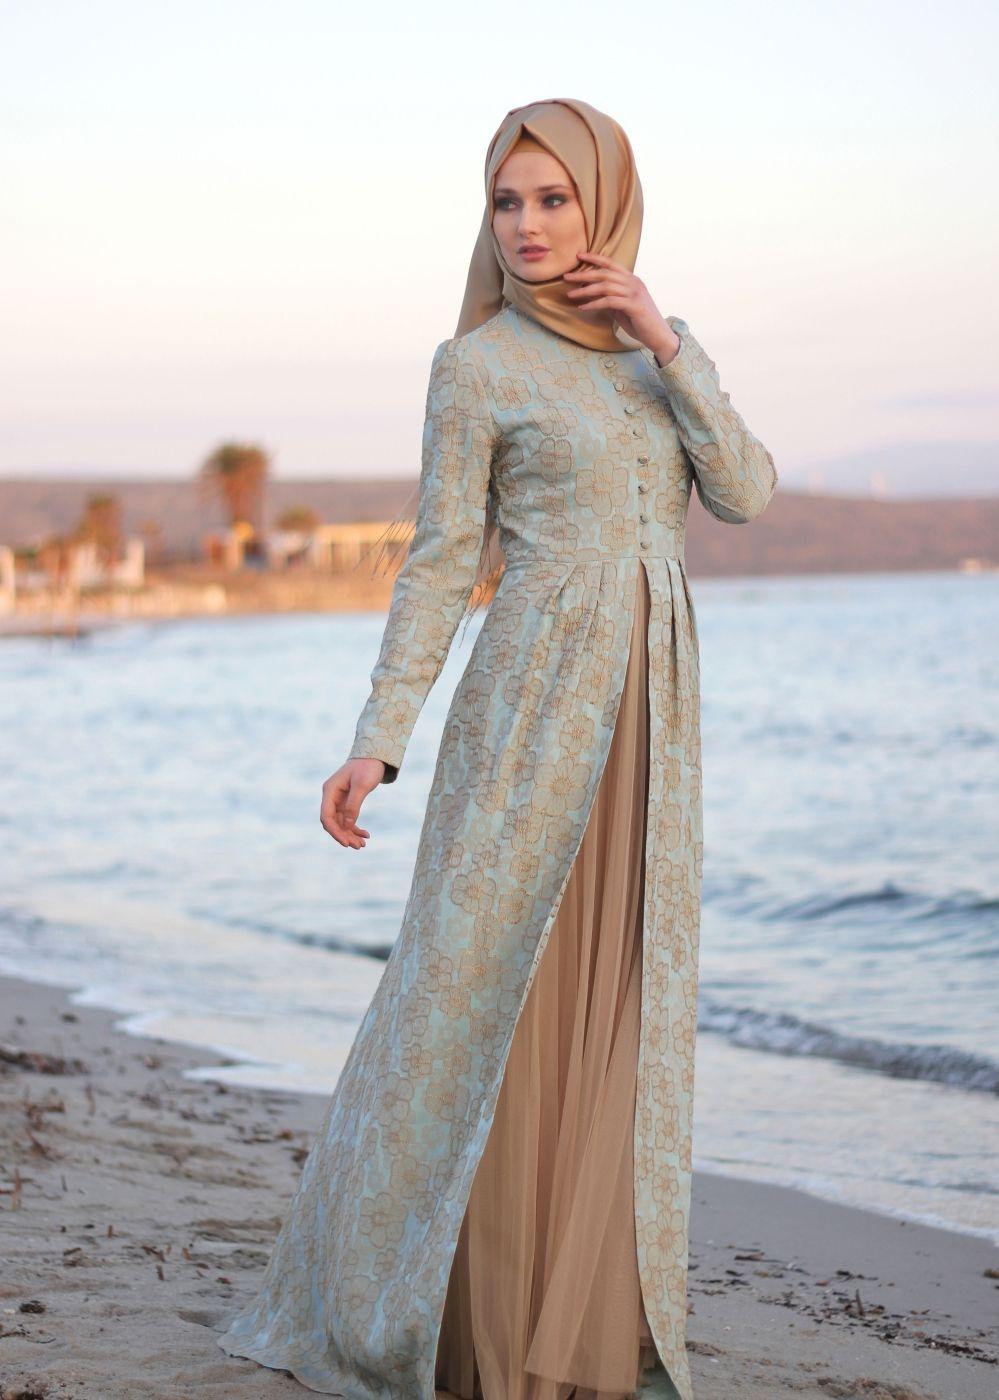 Famelin Tesettür ♥ Muslimah fashion & hijab style